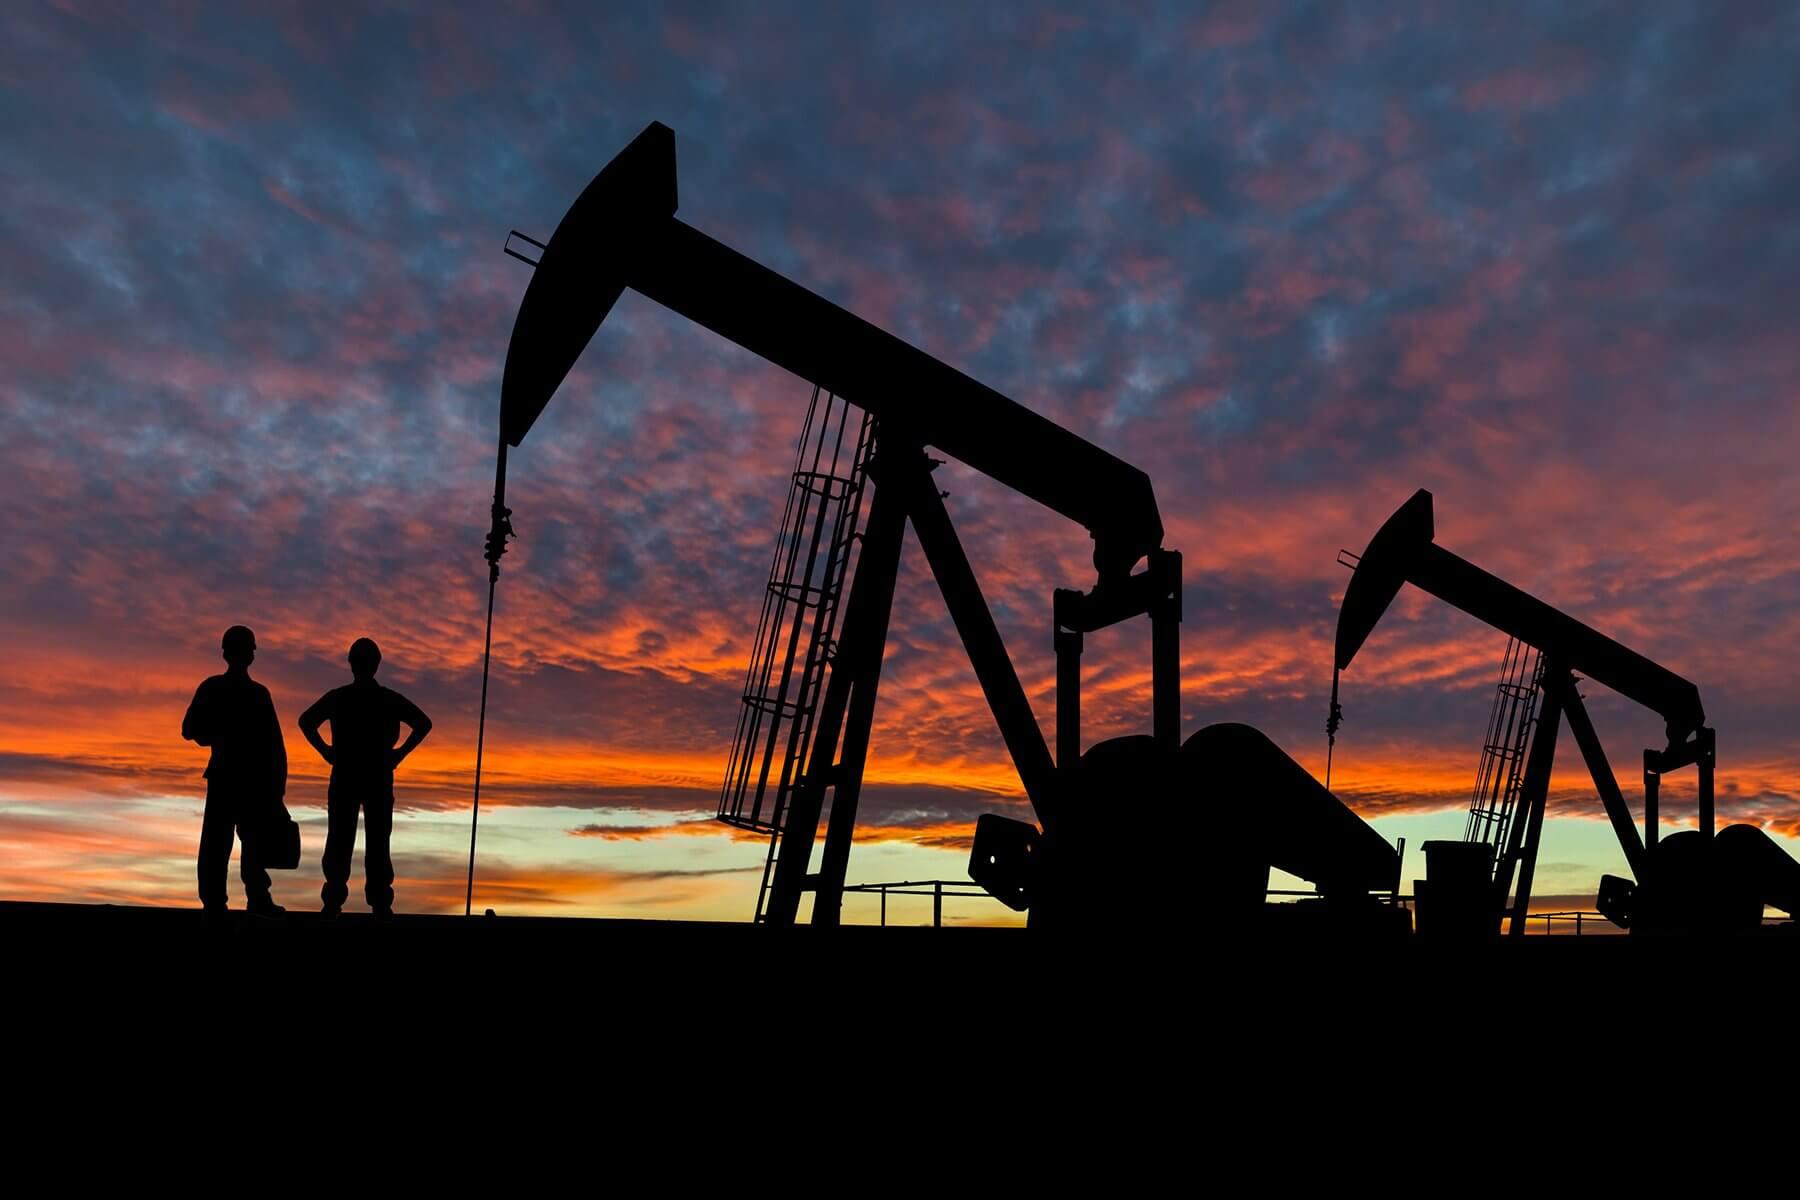 Piyasa Hissiyatındaki düşüşe Rağmen Ham Petrol Fiyatları Yükseldi!